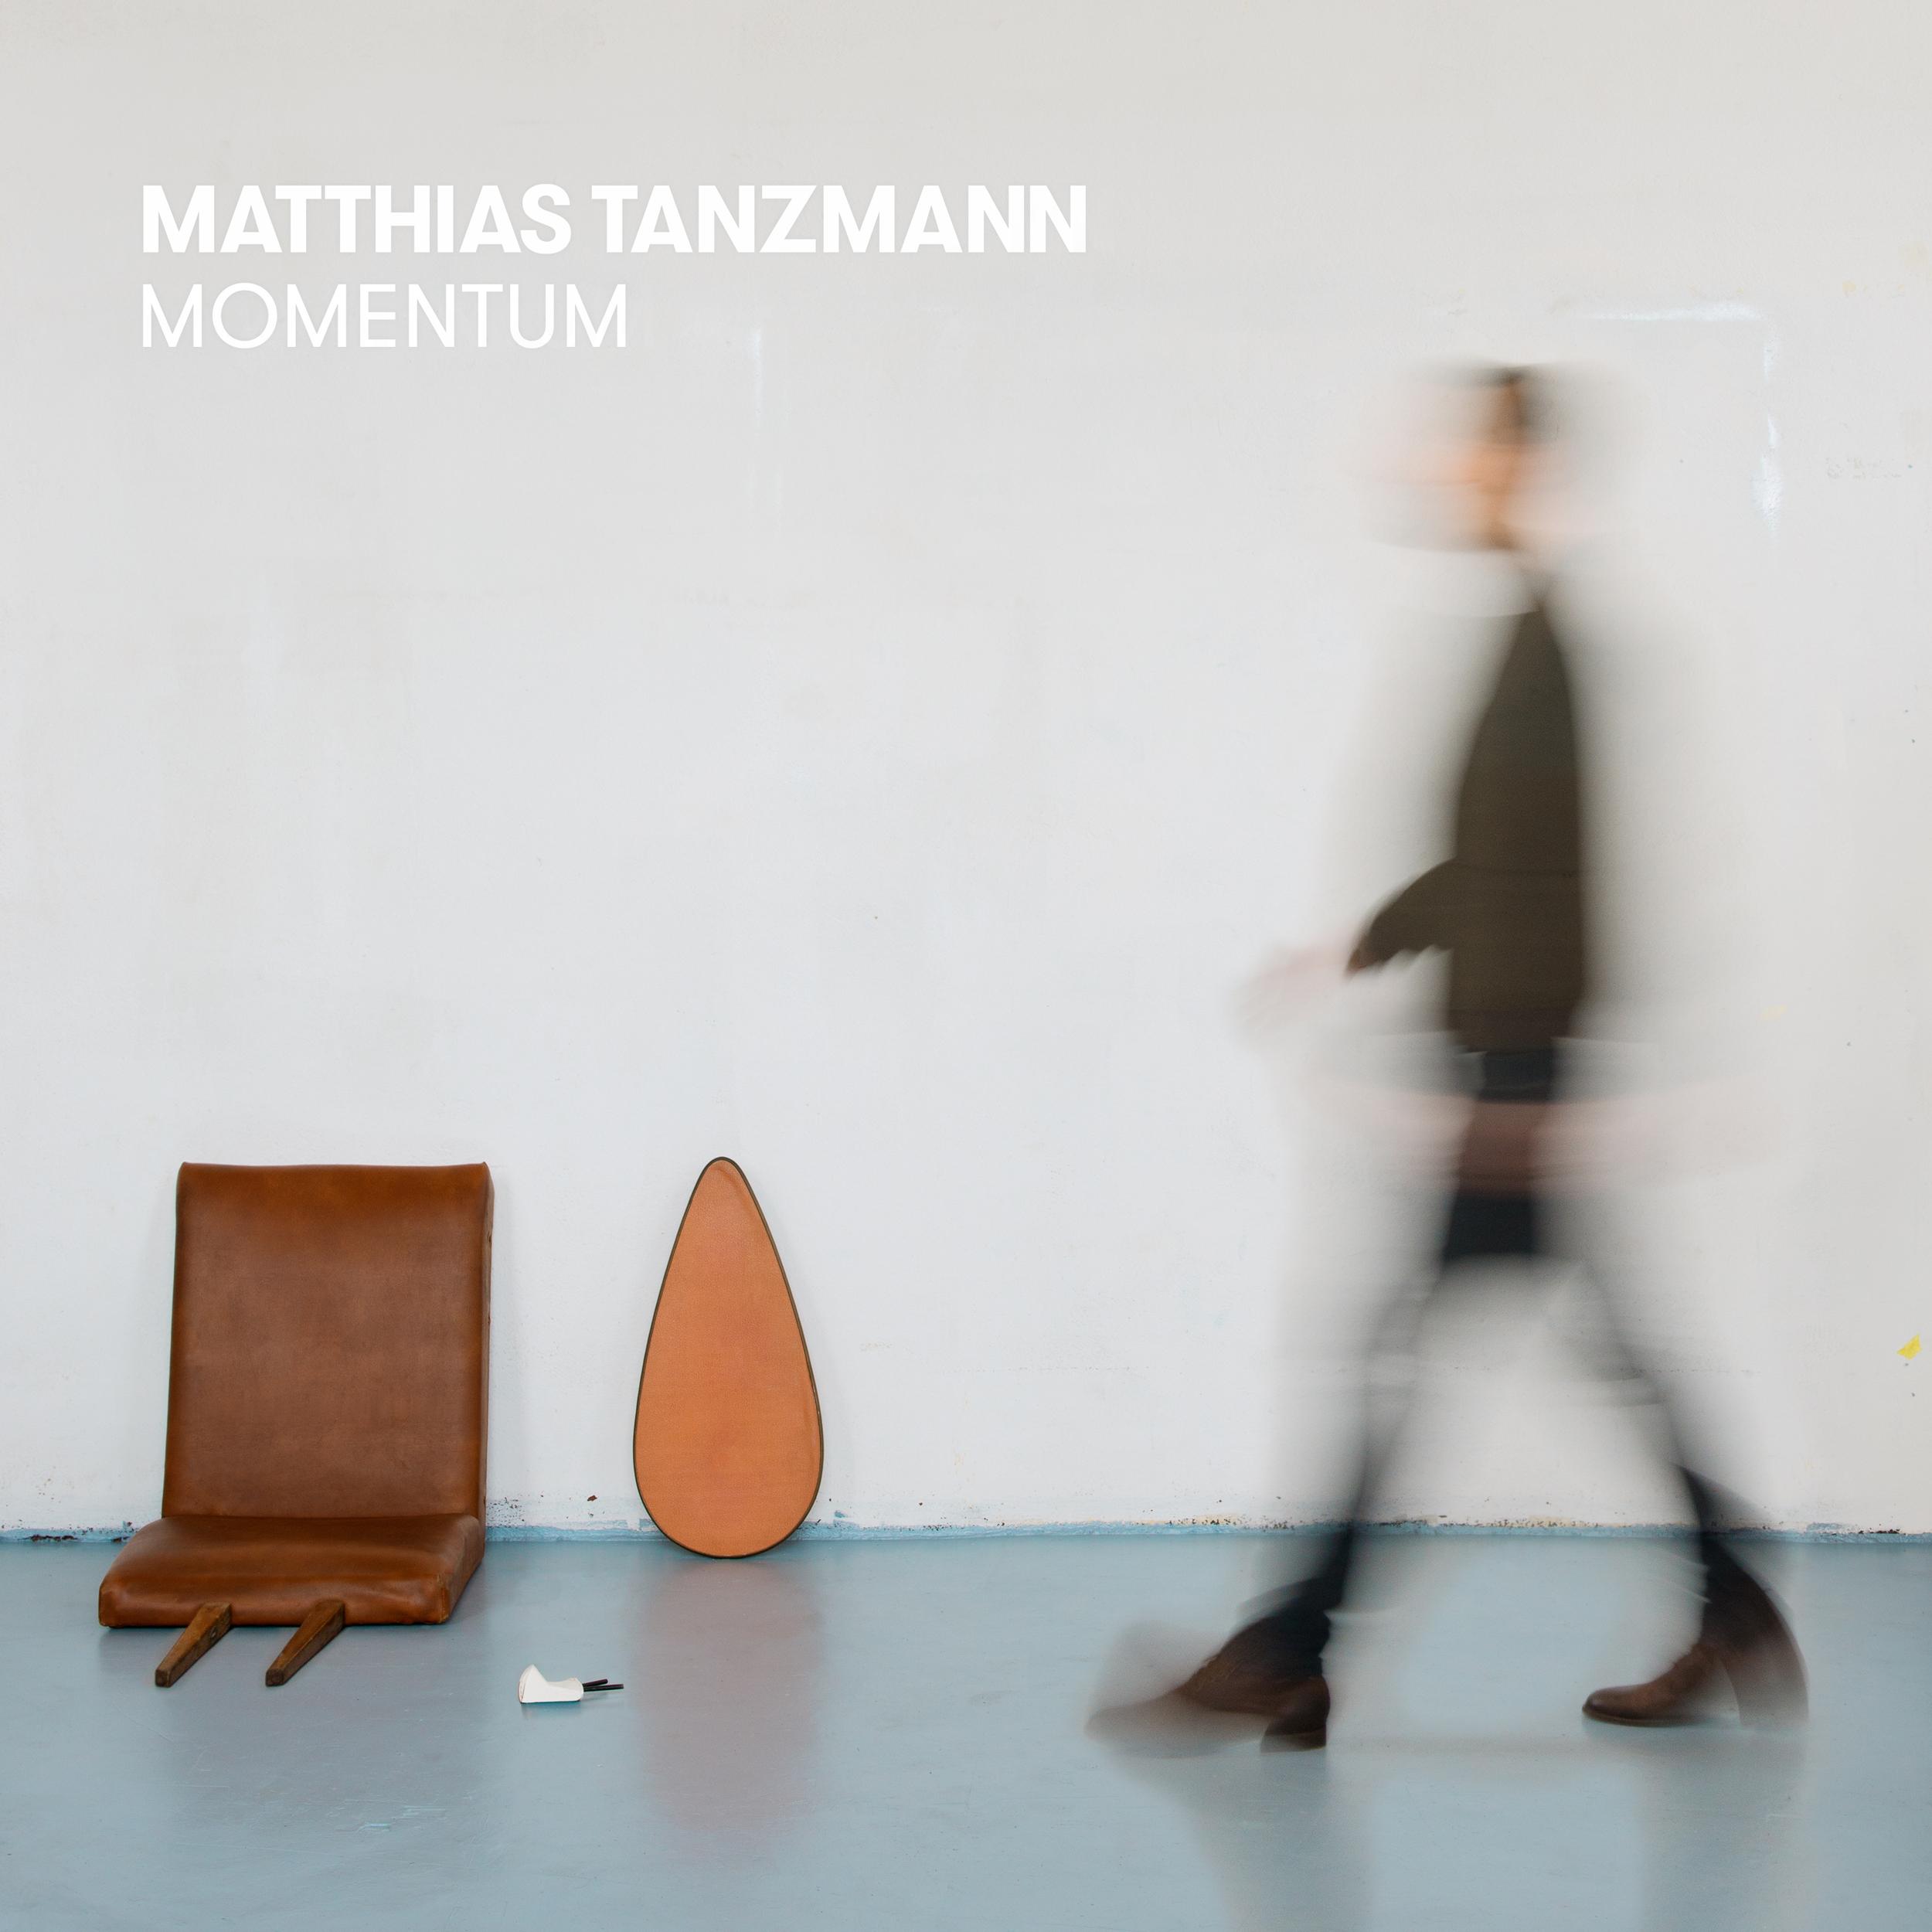 Matthias Tanzmann - Momentum